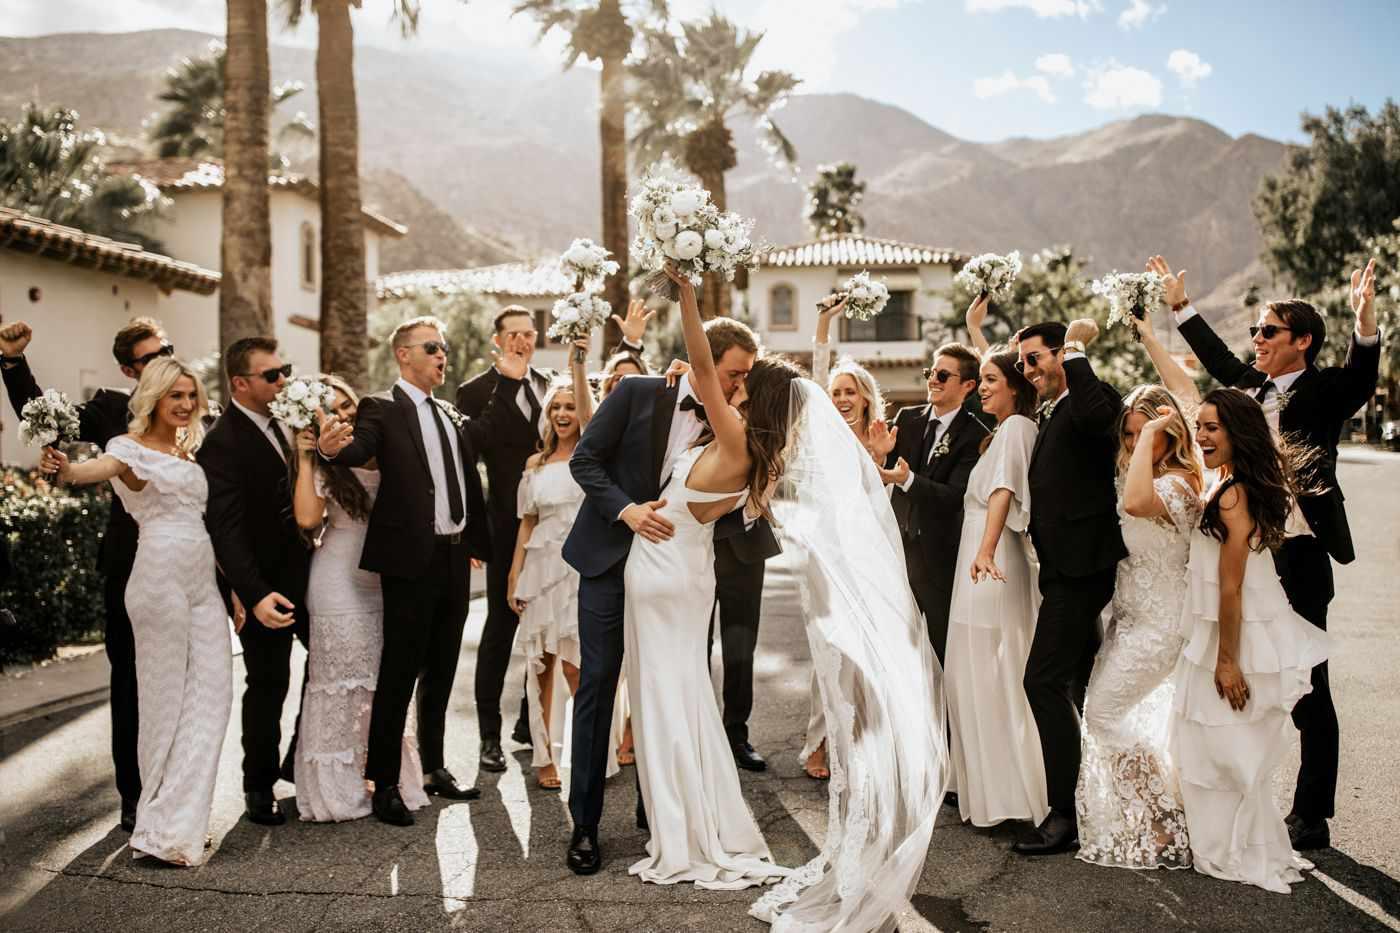 Sam and Nate wedding